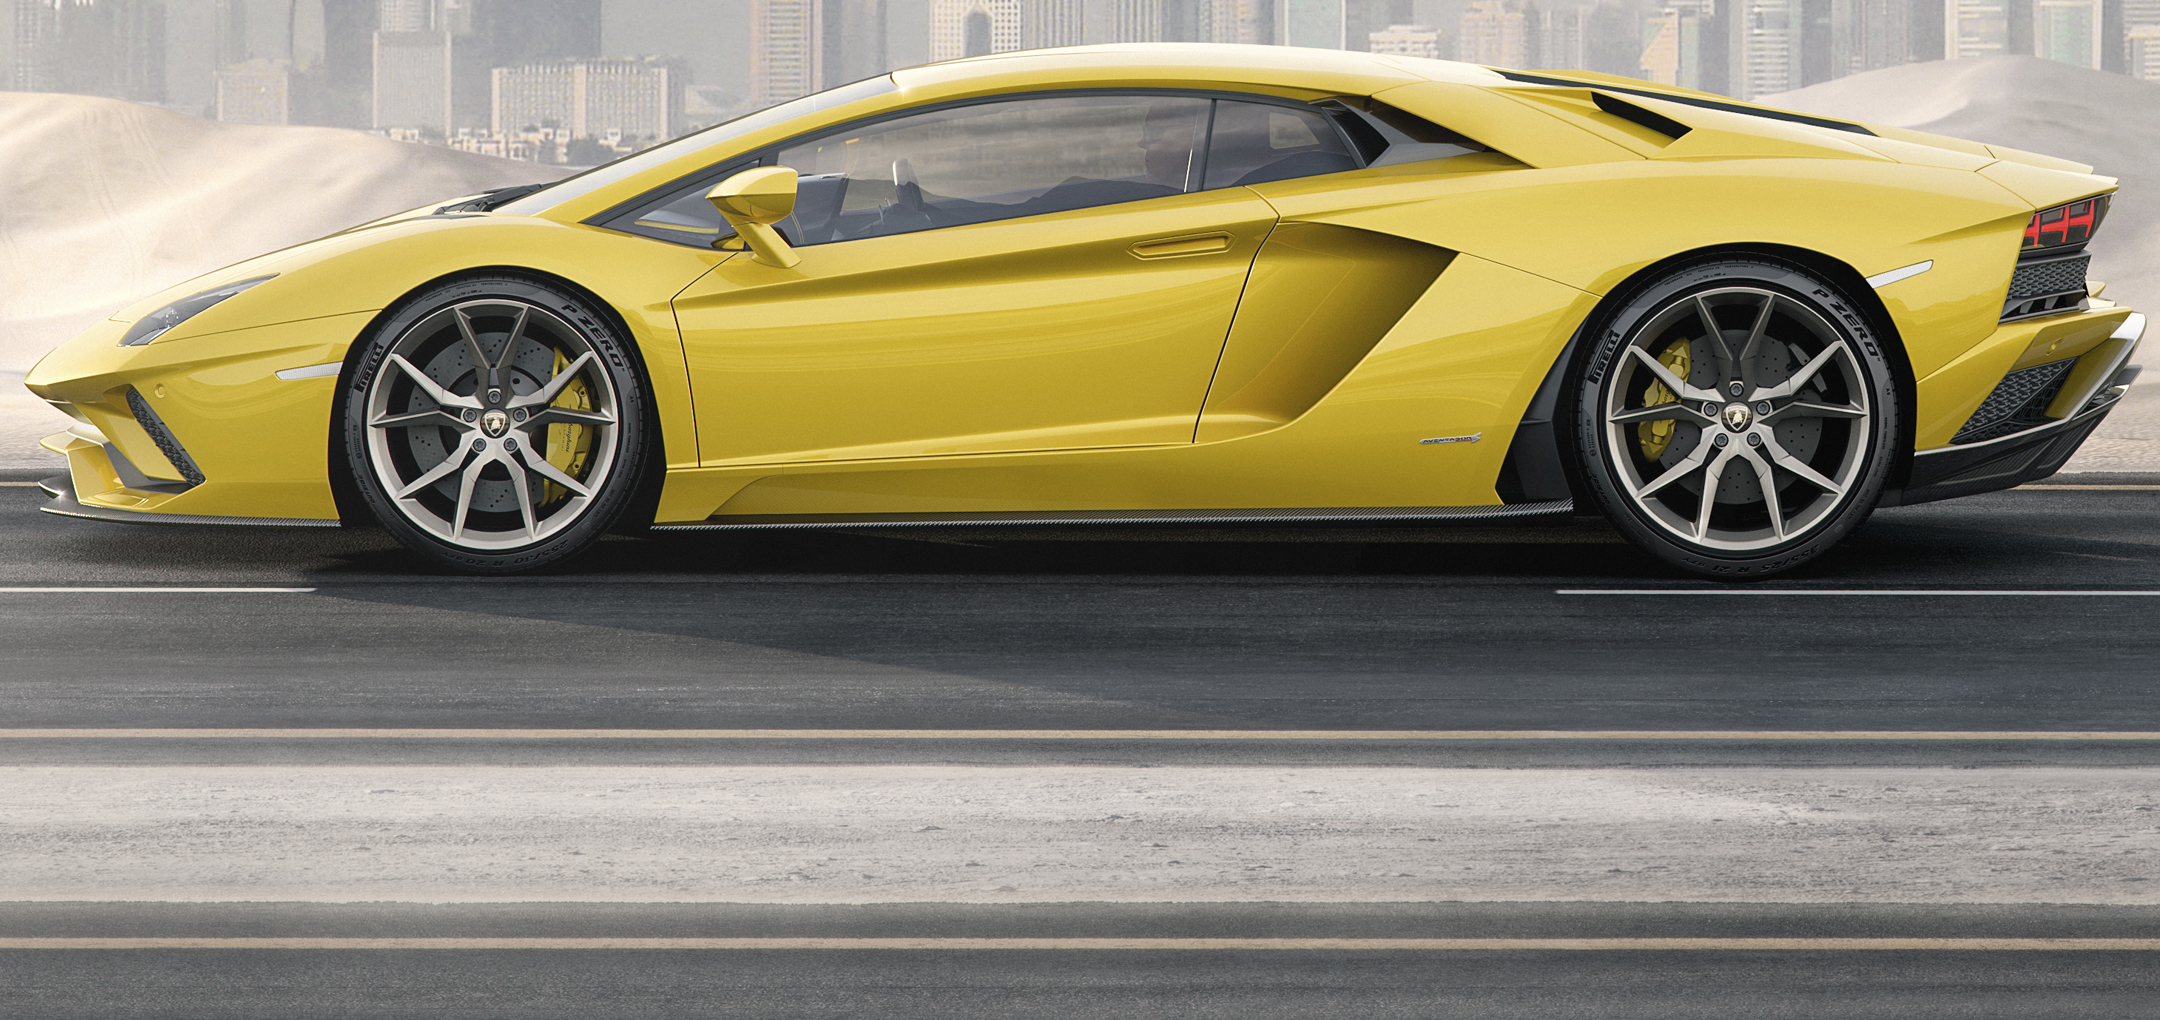 Lamborghini Aventador S - side-face / profil - wheel / jante